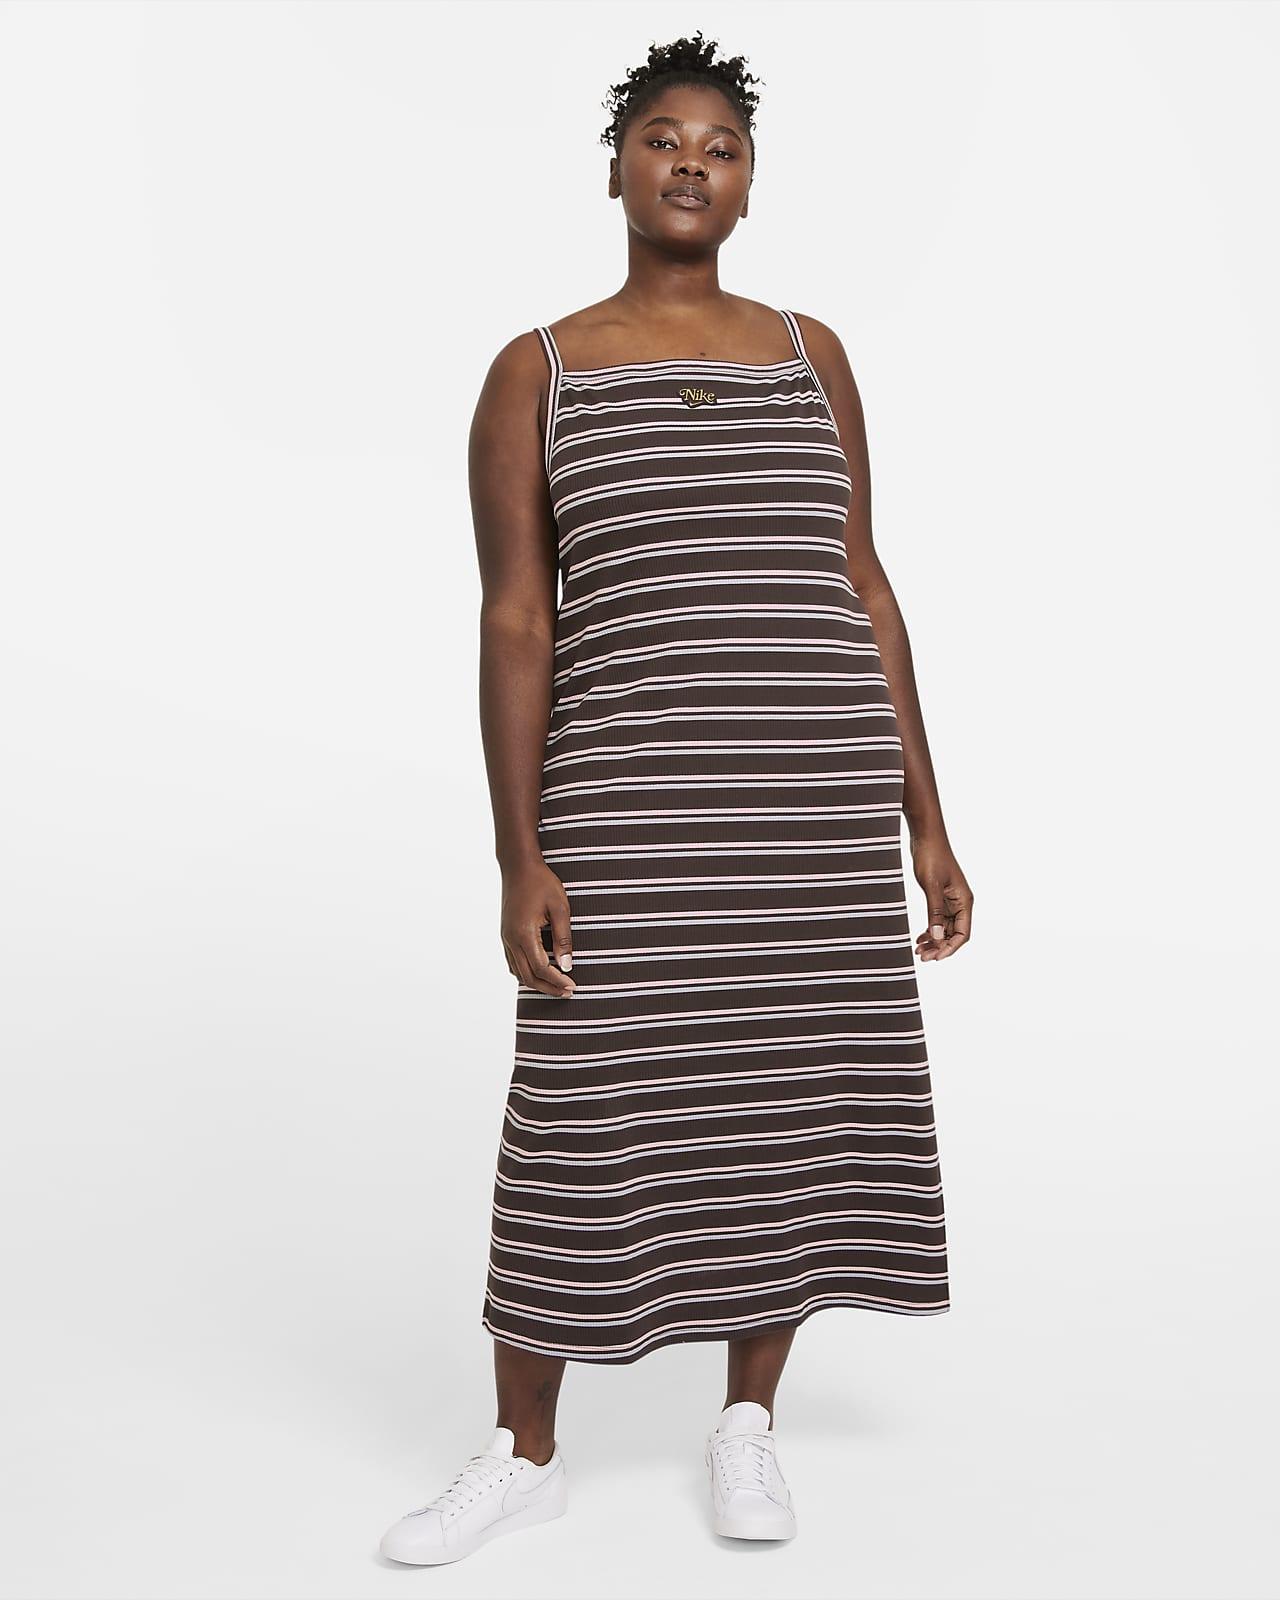 Vestido Nike Sportswear Femme para mulher (tamanho Plus)